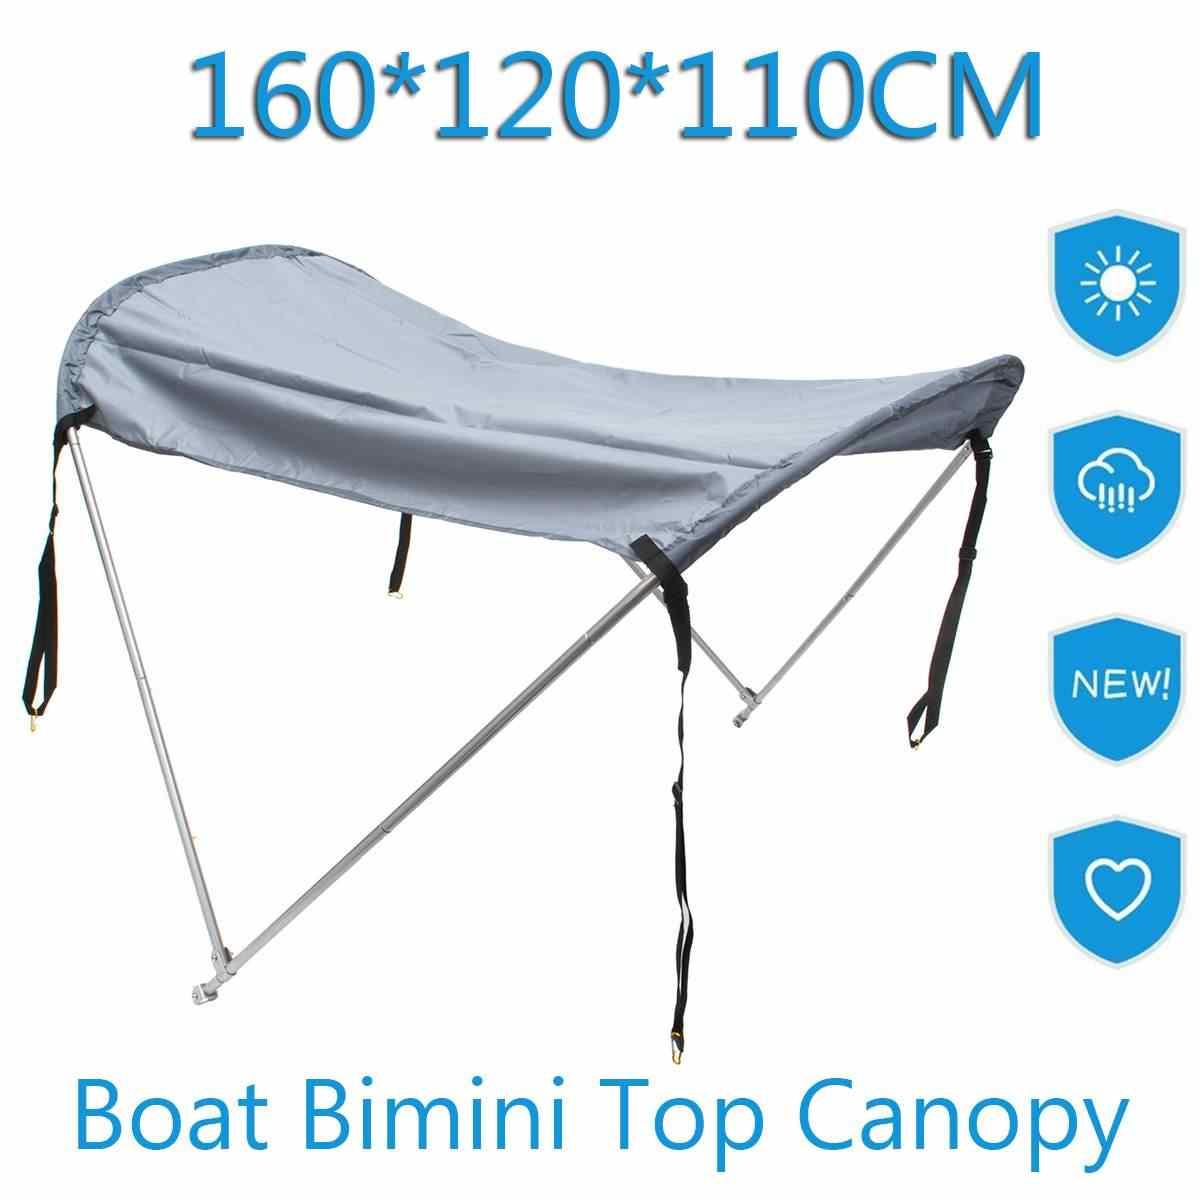 Bimini TOP ม่านบังแดด flatable เรือเรือ PVC Dinghy raft อุปกรณ์เสริมซันไชน์ PVC เรือตกปลาเต็นท์ Canopy